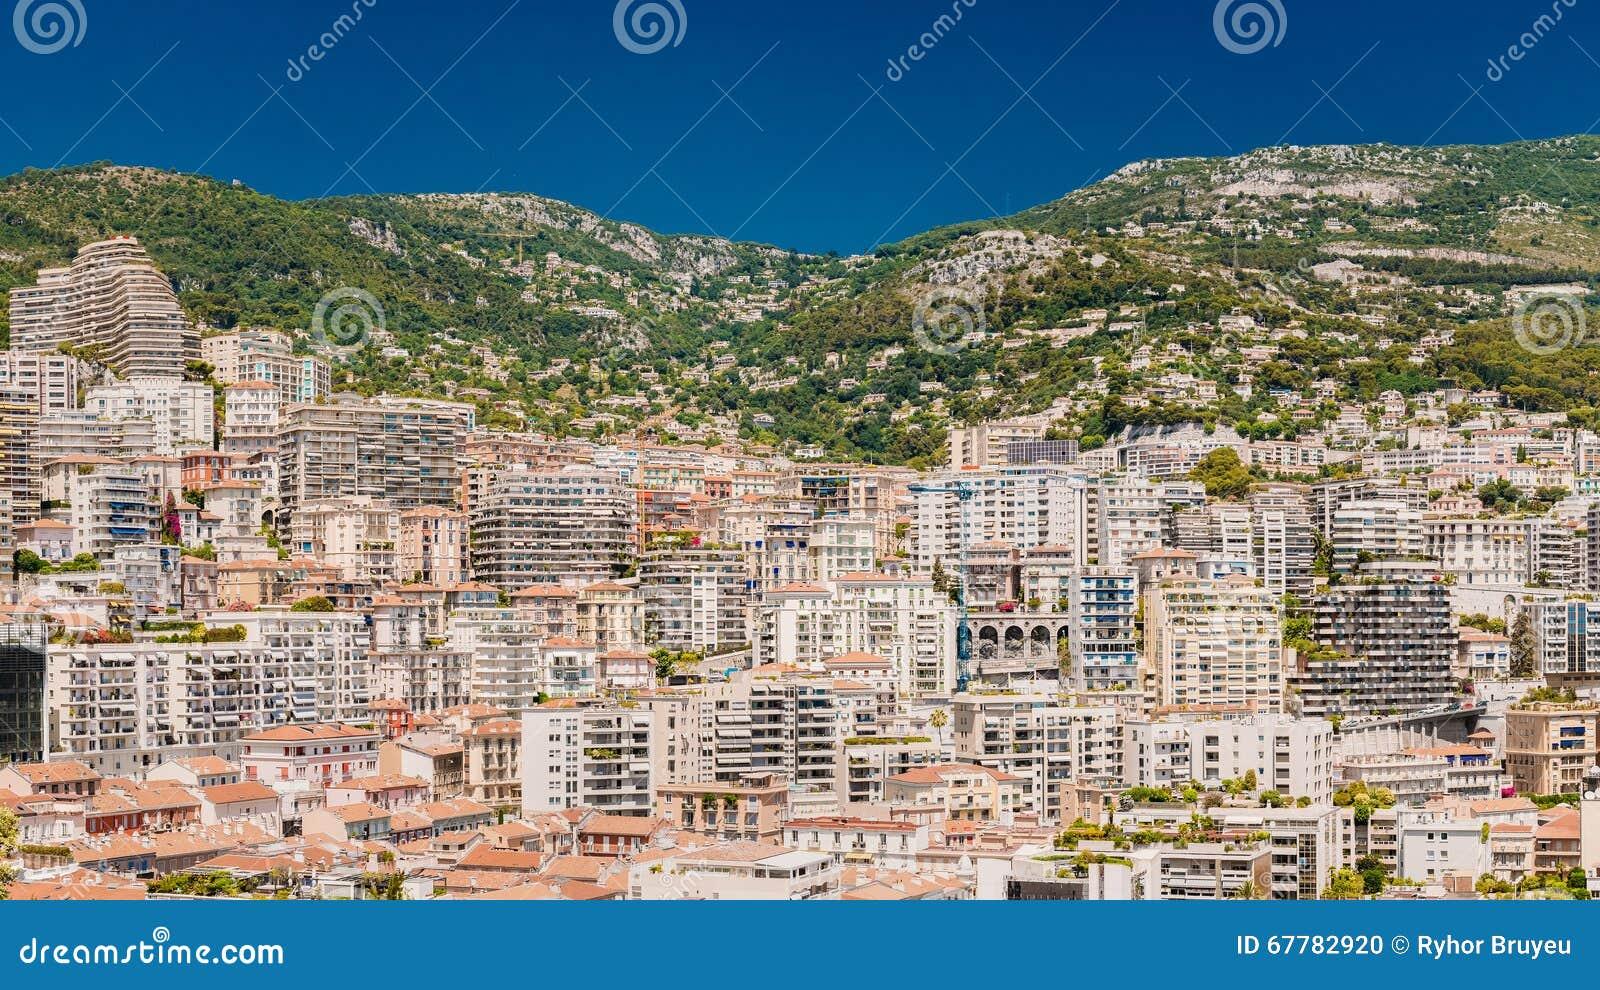 Le monaco architecture de domaine de monte carlo real sur for Domaine architecture